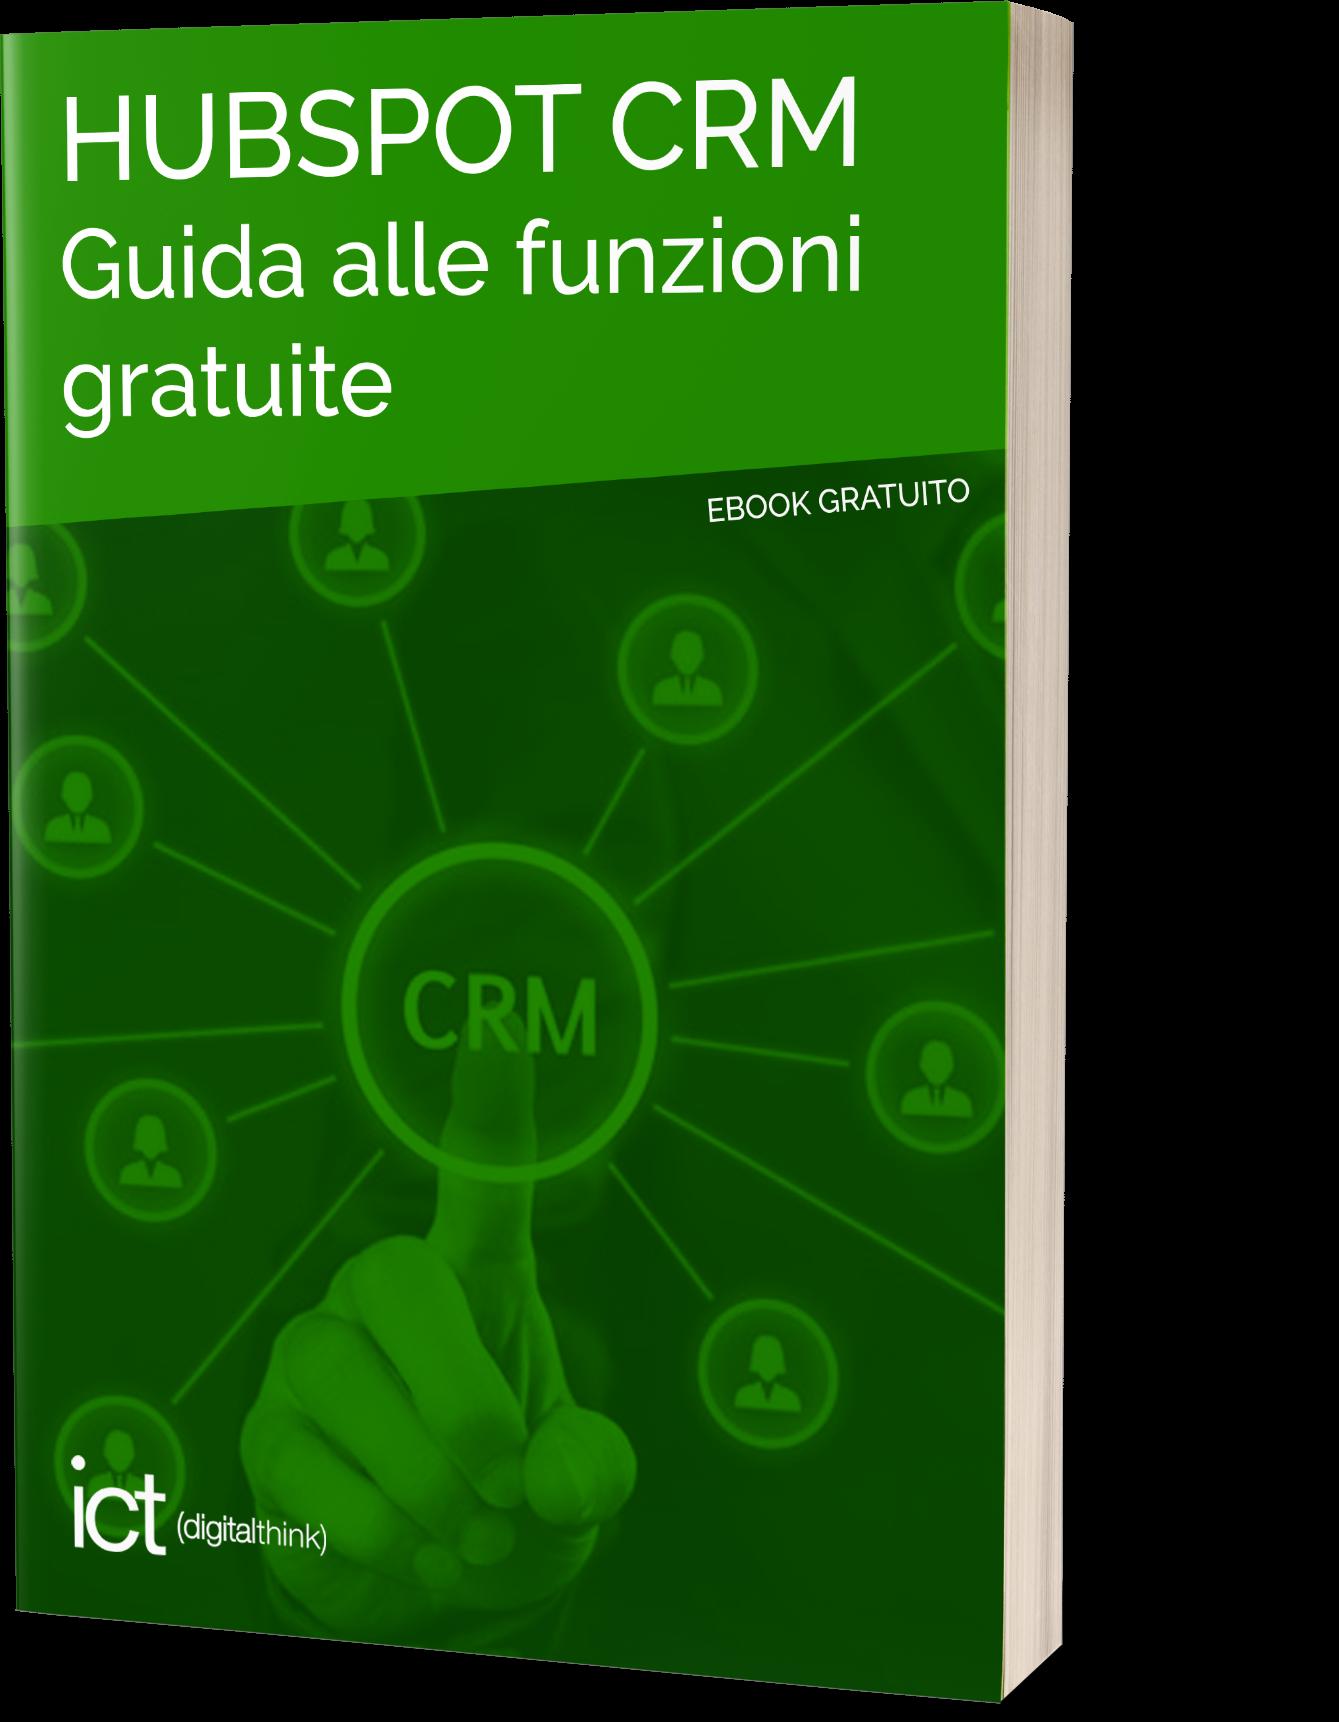 HUBSPOT CRM: Guida alle funzioni gratuite